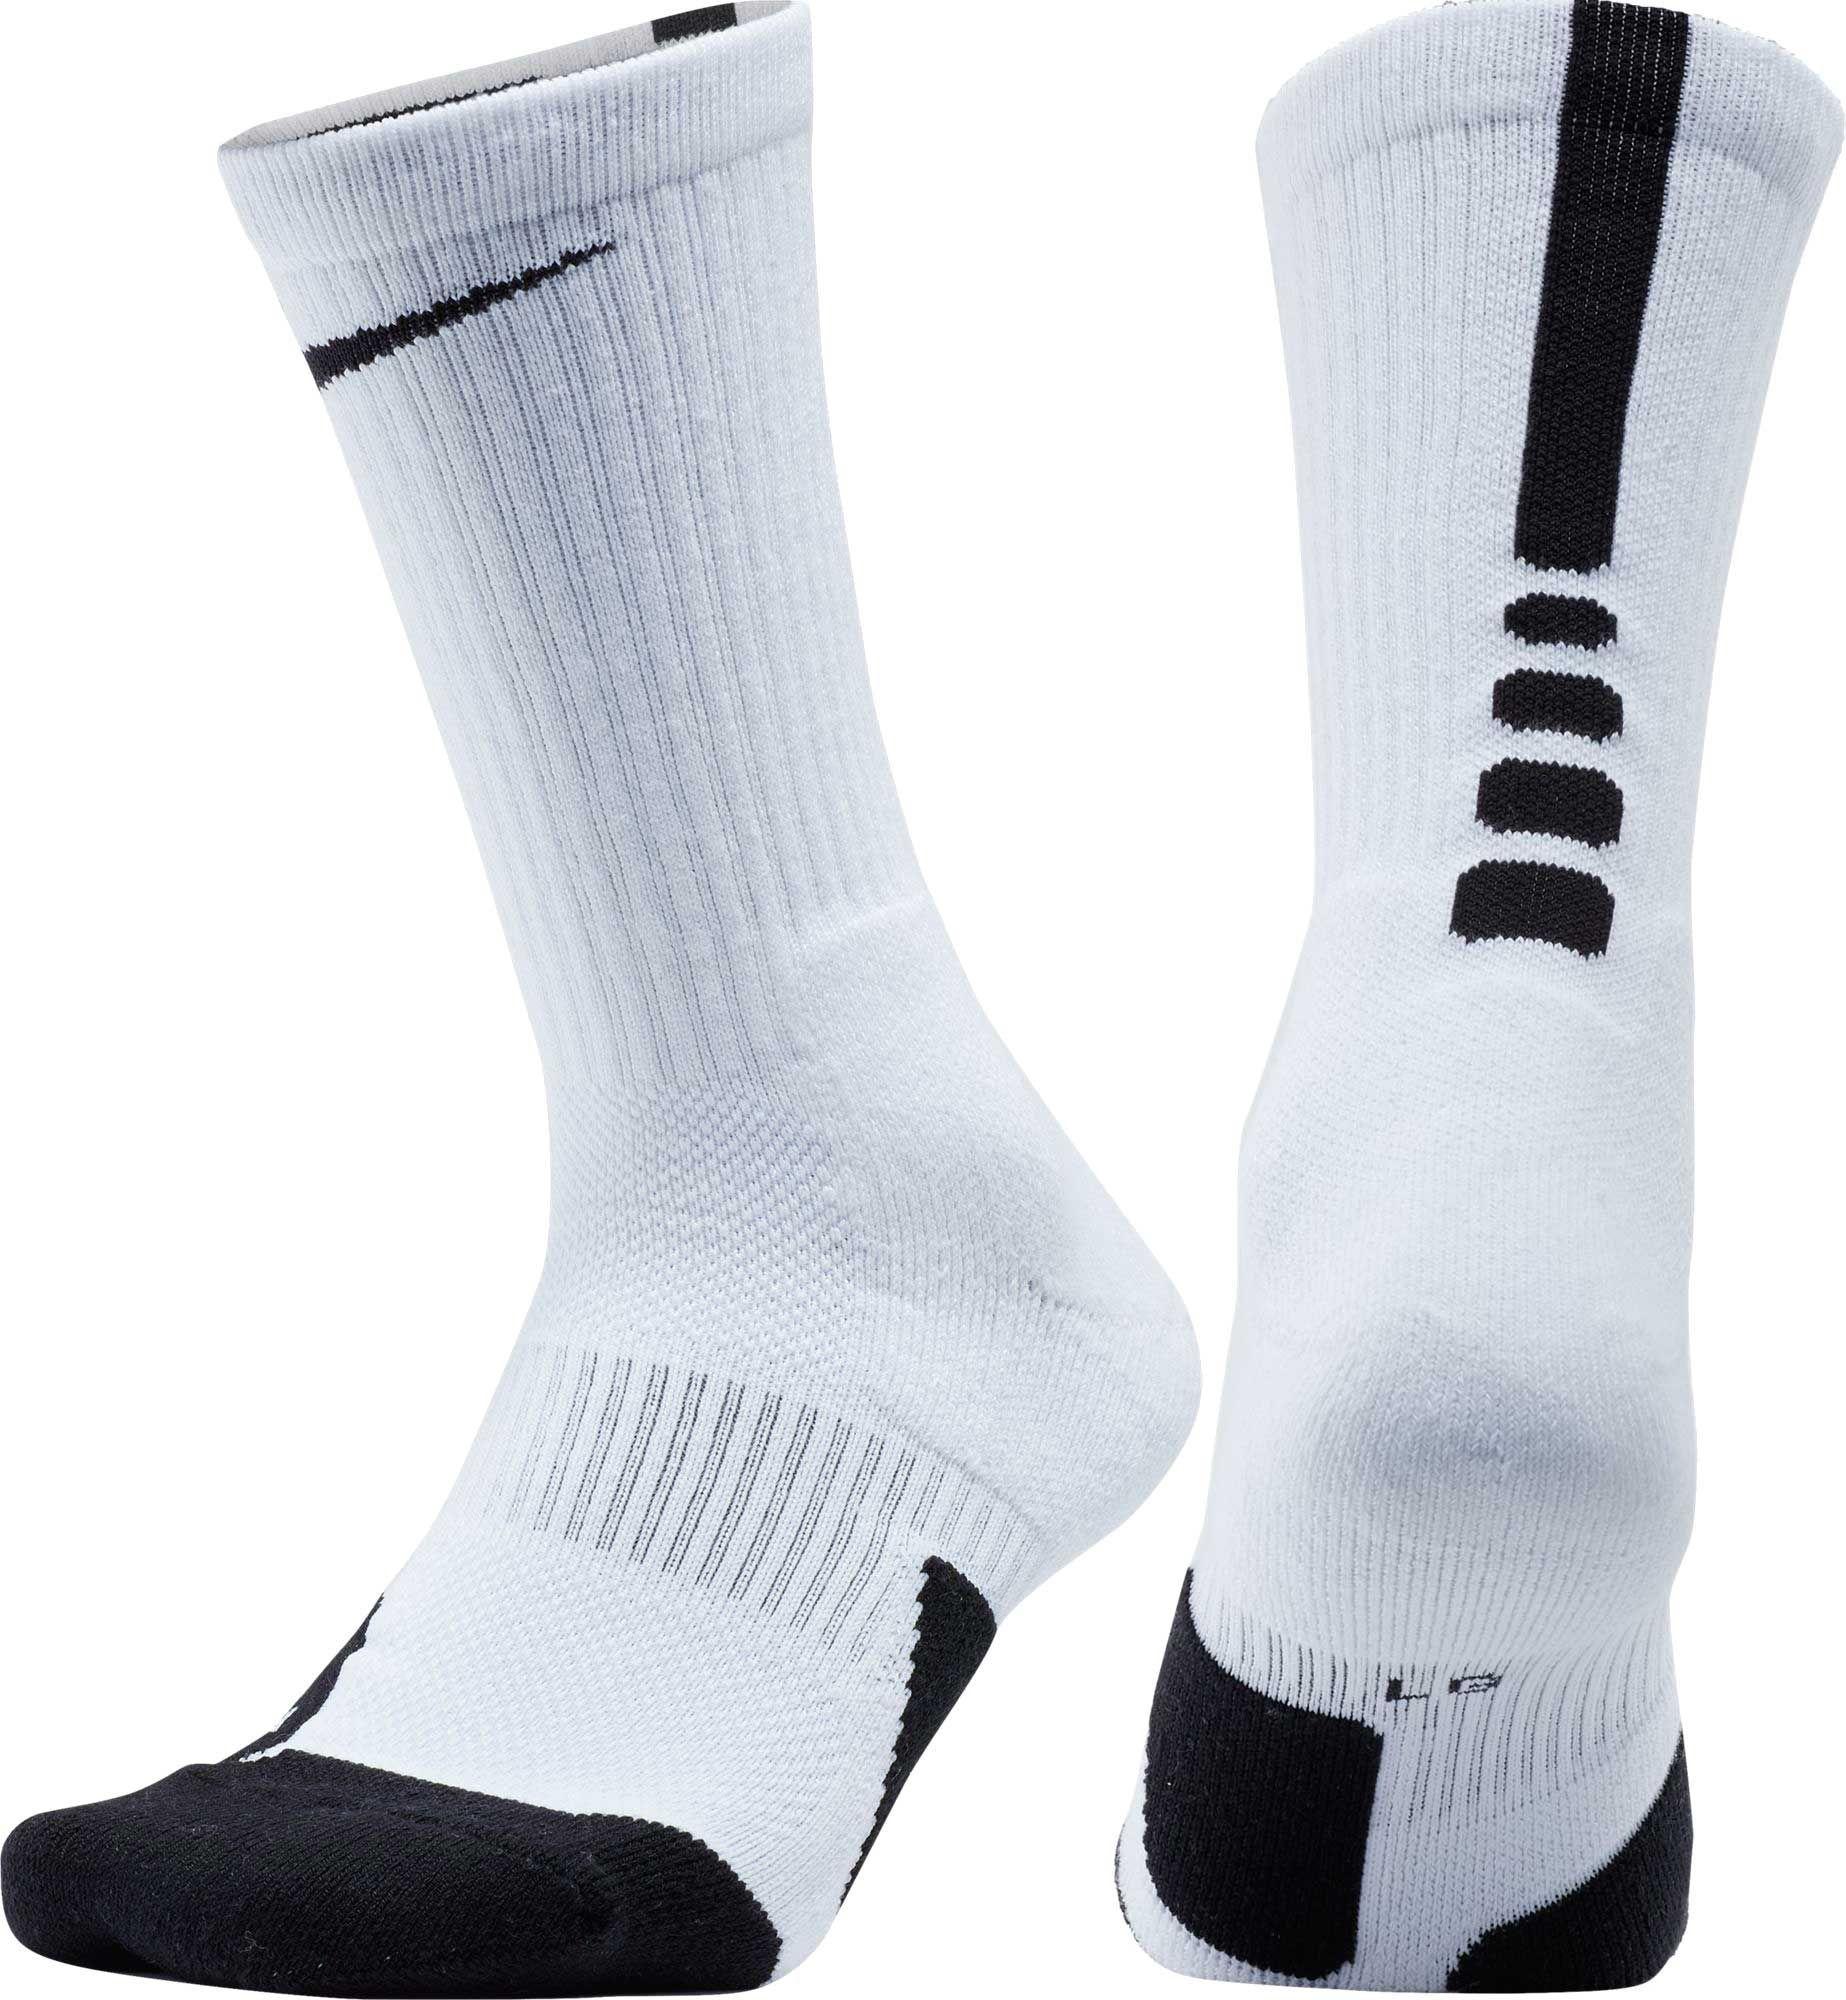 Nike Dry Elite 1 5 Crew Basketball Socks Nike Basketball Socks White Nike Socks Basketball Socks